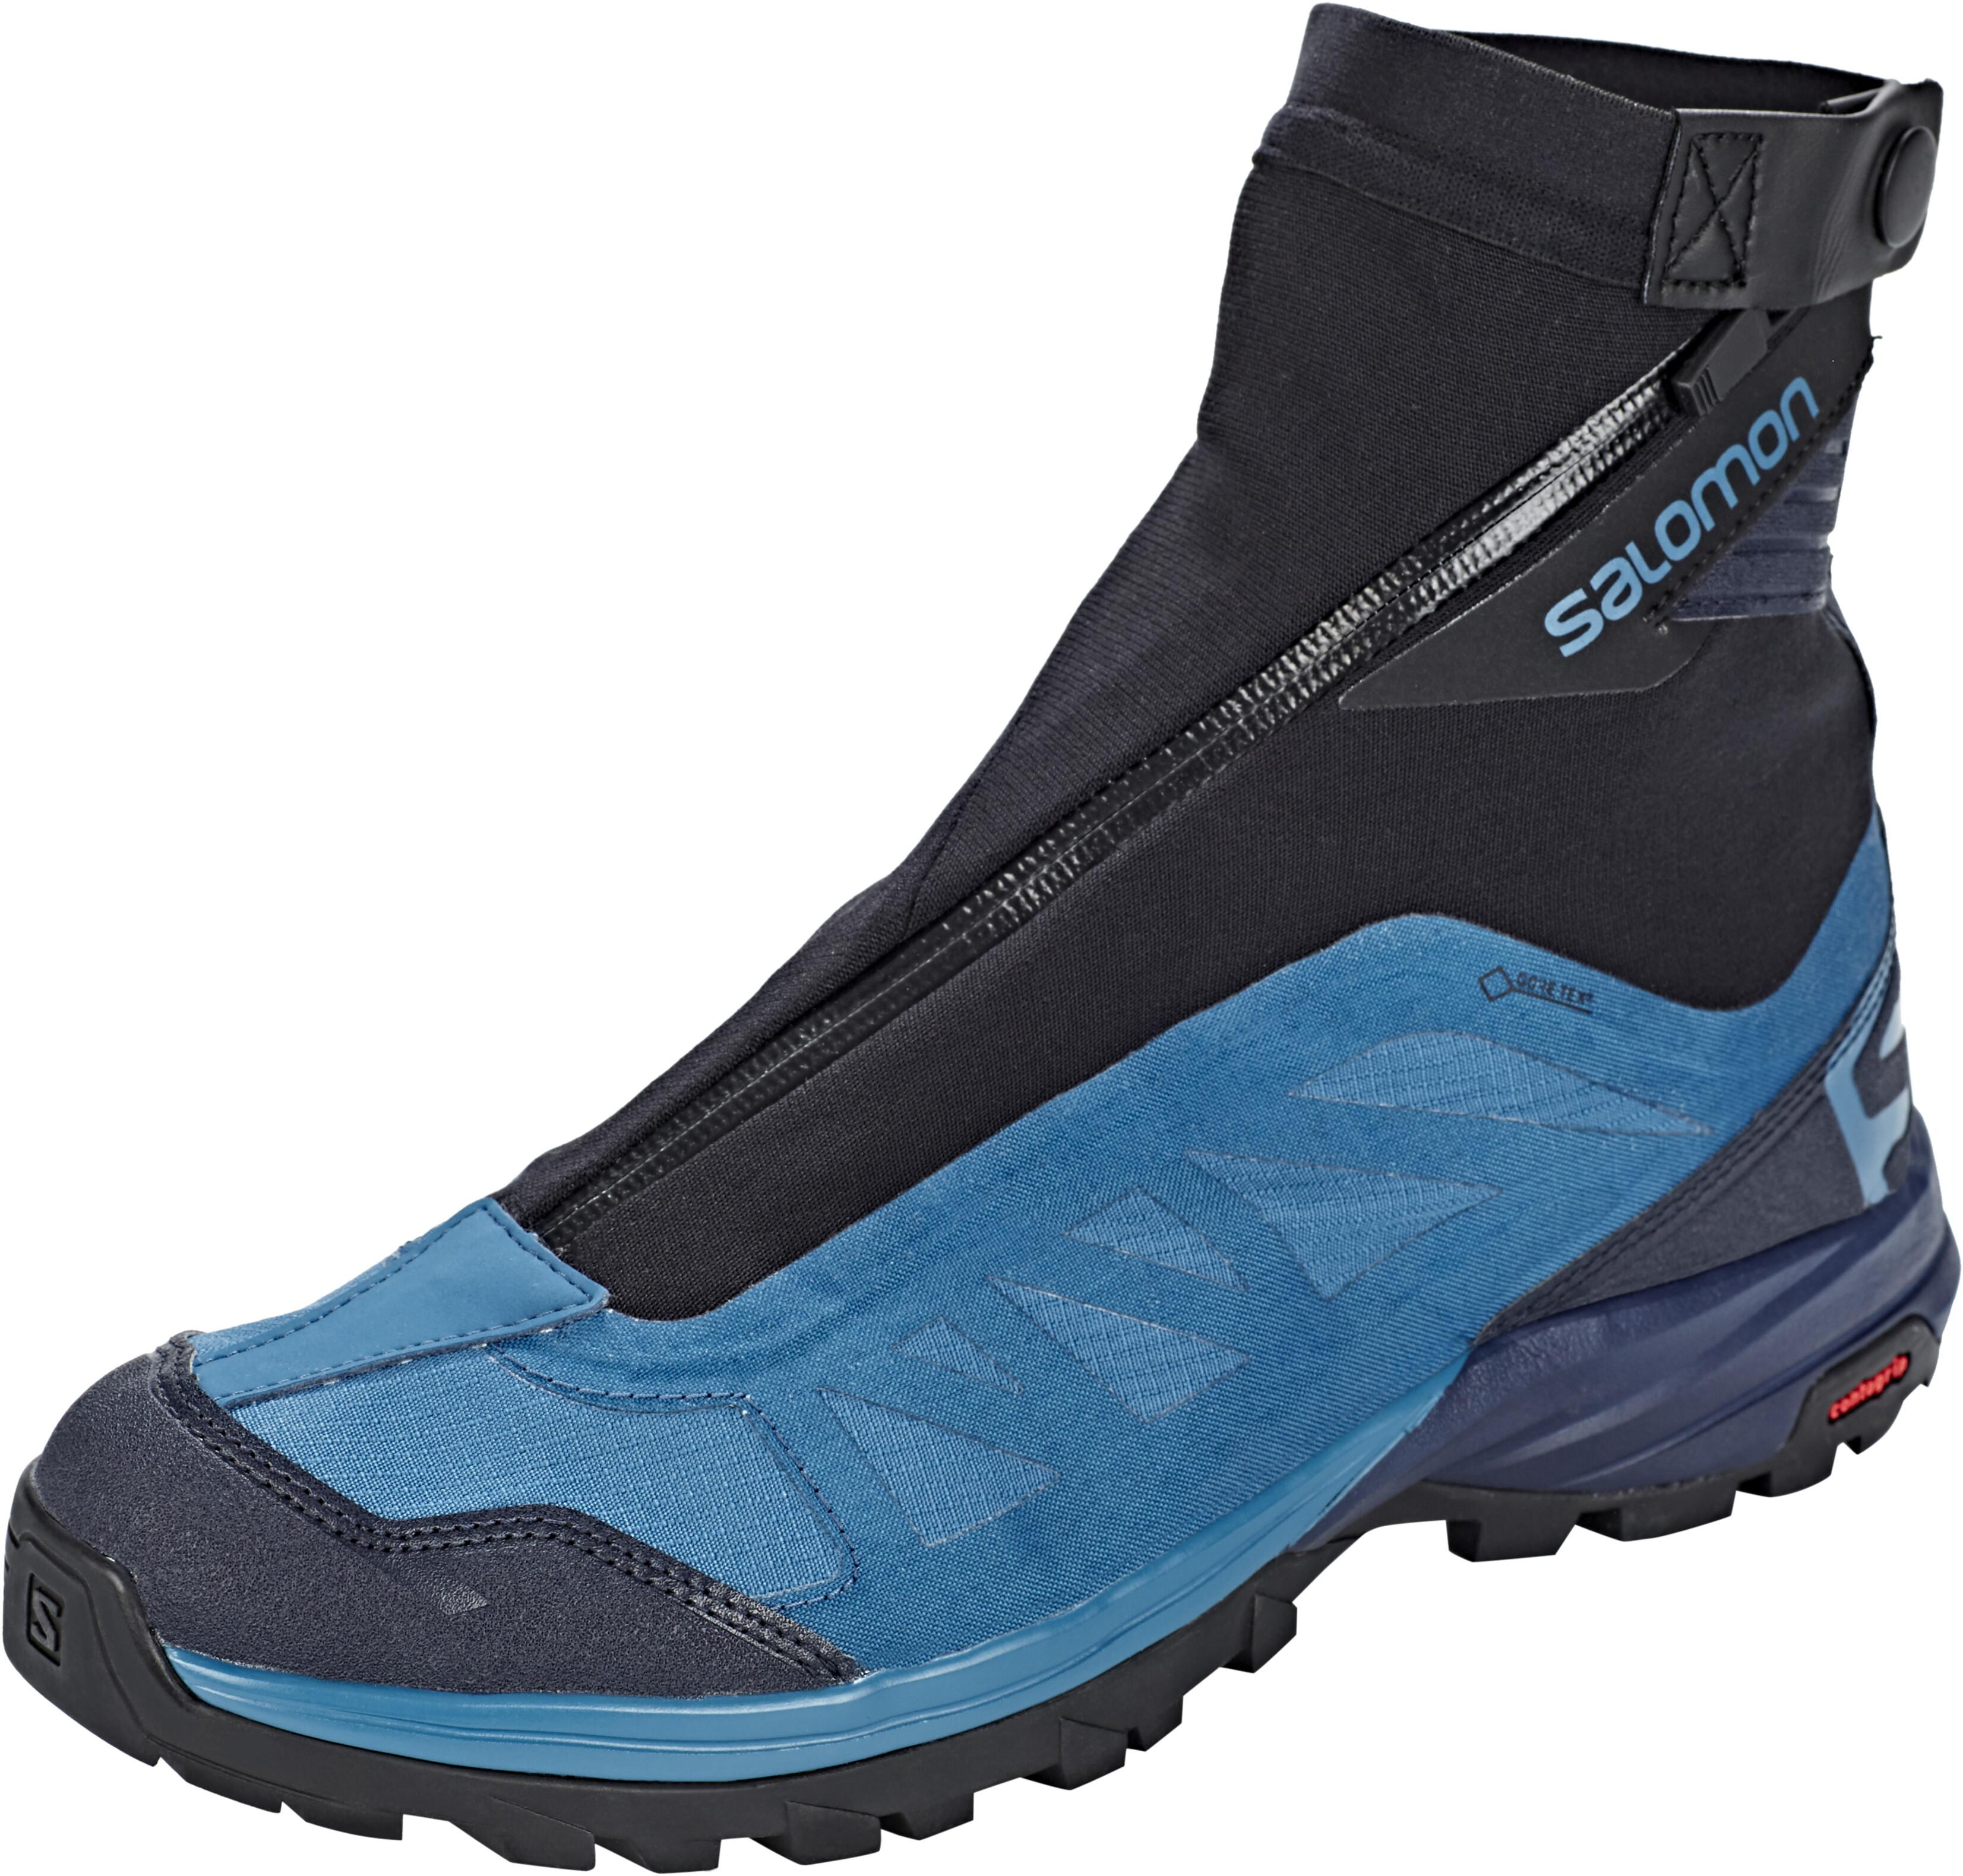 Salomon Outpath Pro GTX Miehet kengät  27a55eaf35